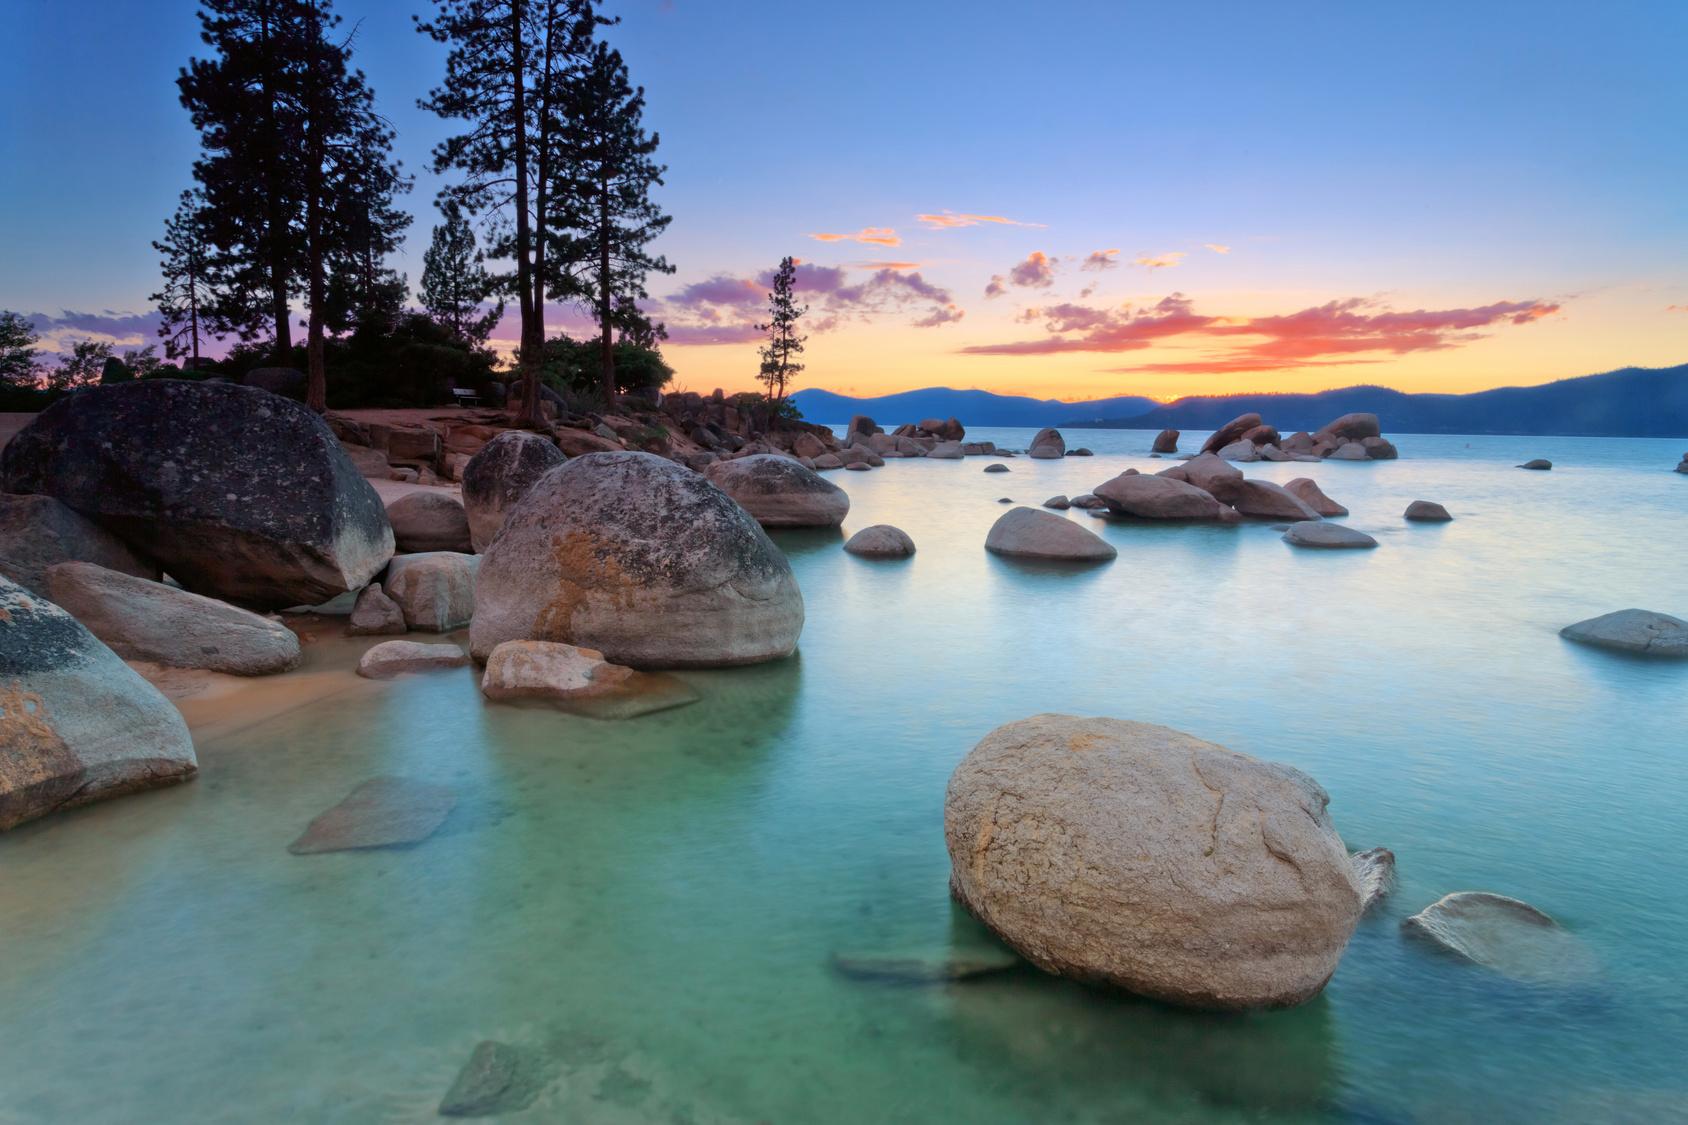 Beautiful Lake Tahoe In California S Sierra Nevada Mountains Photo Mariusz Blach Fotolia